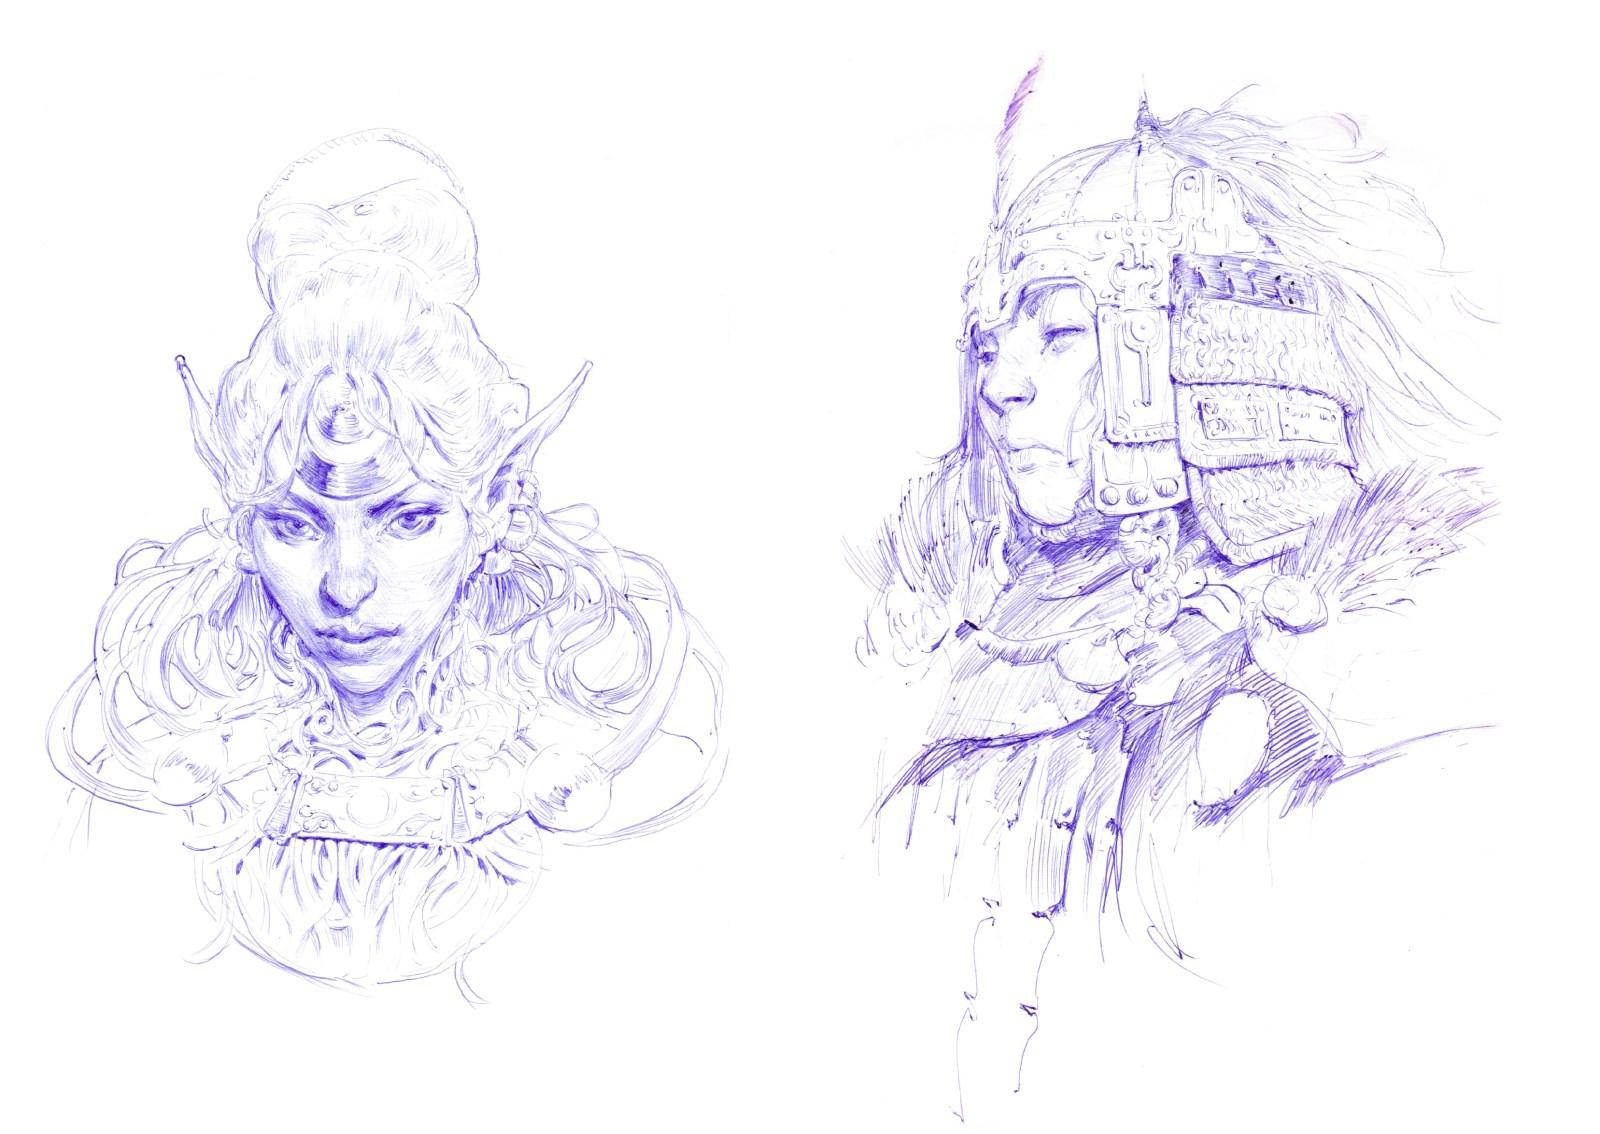 Croquis de personnages fantasy femmes, issus du sketchbook Decade d'Even Mehl Amundsen.